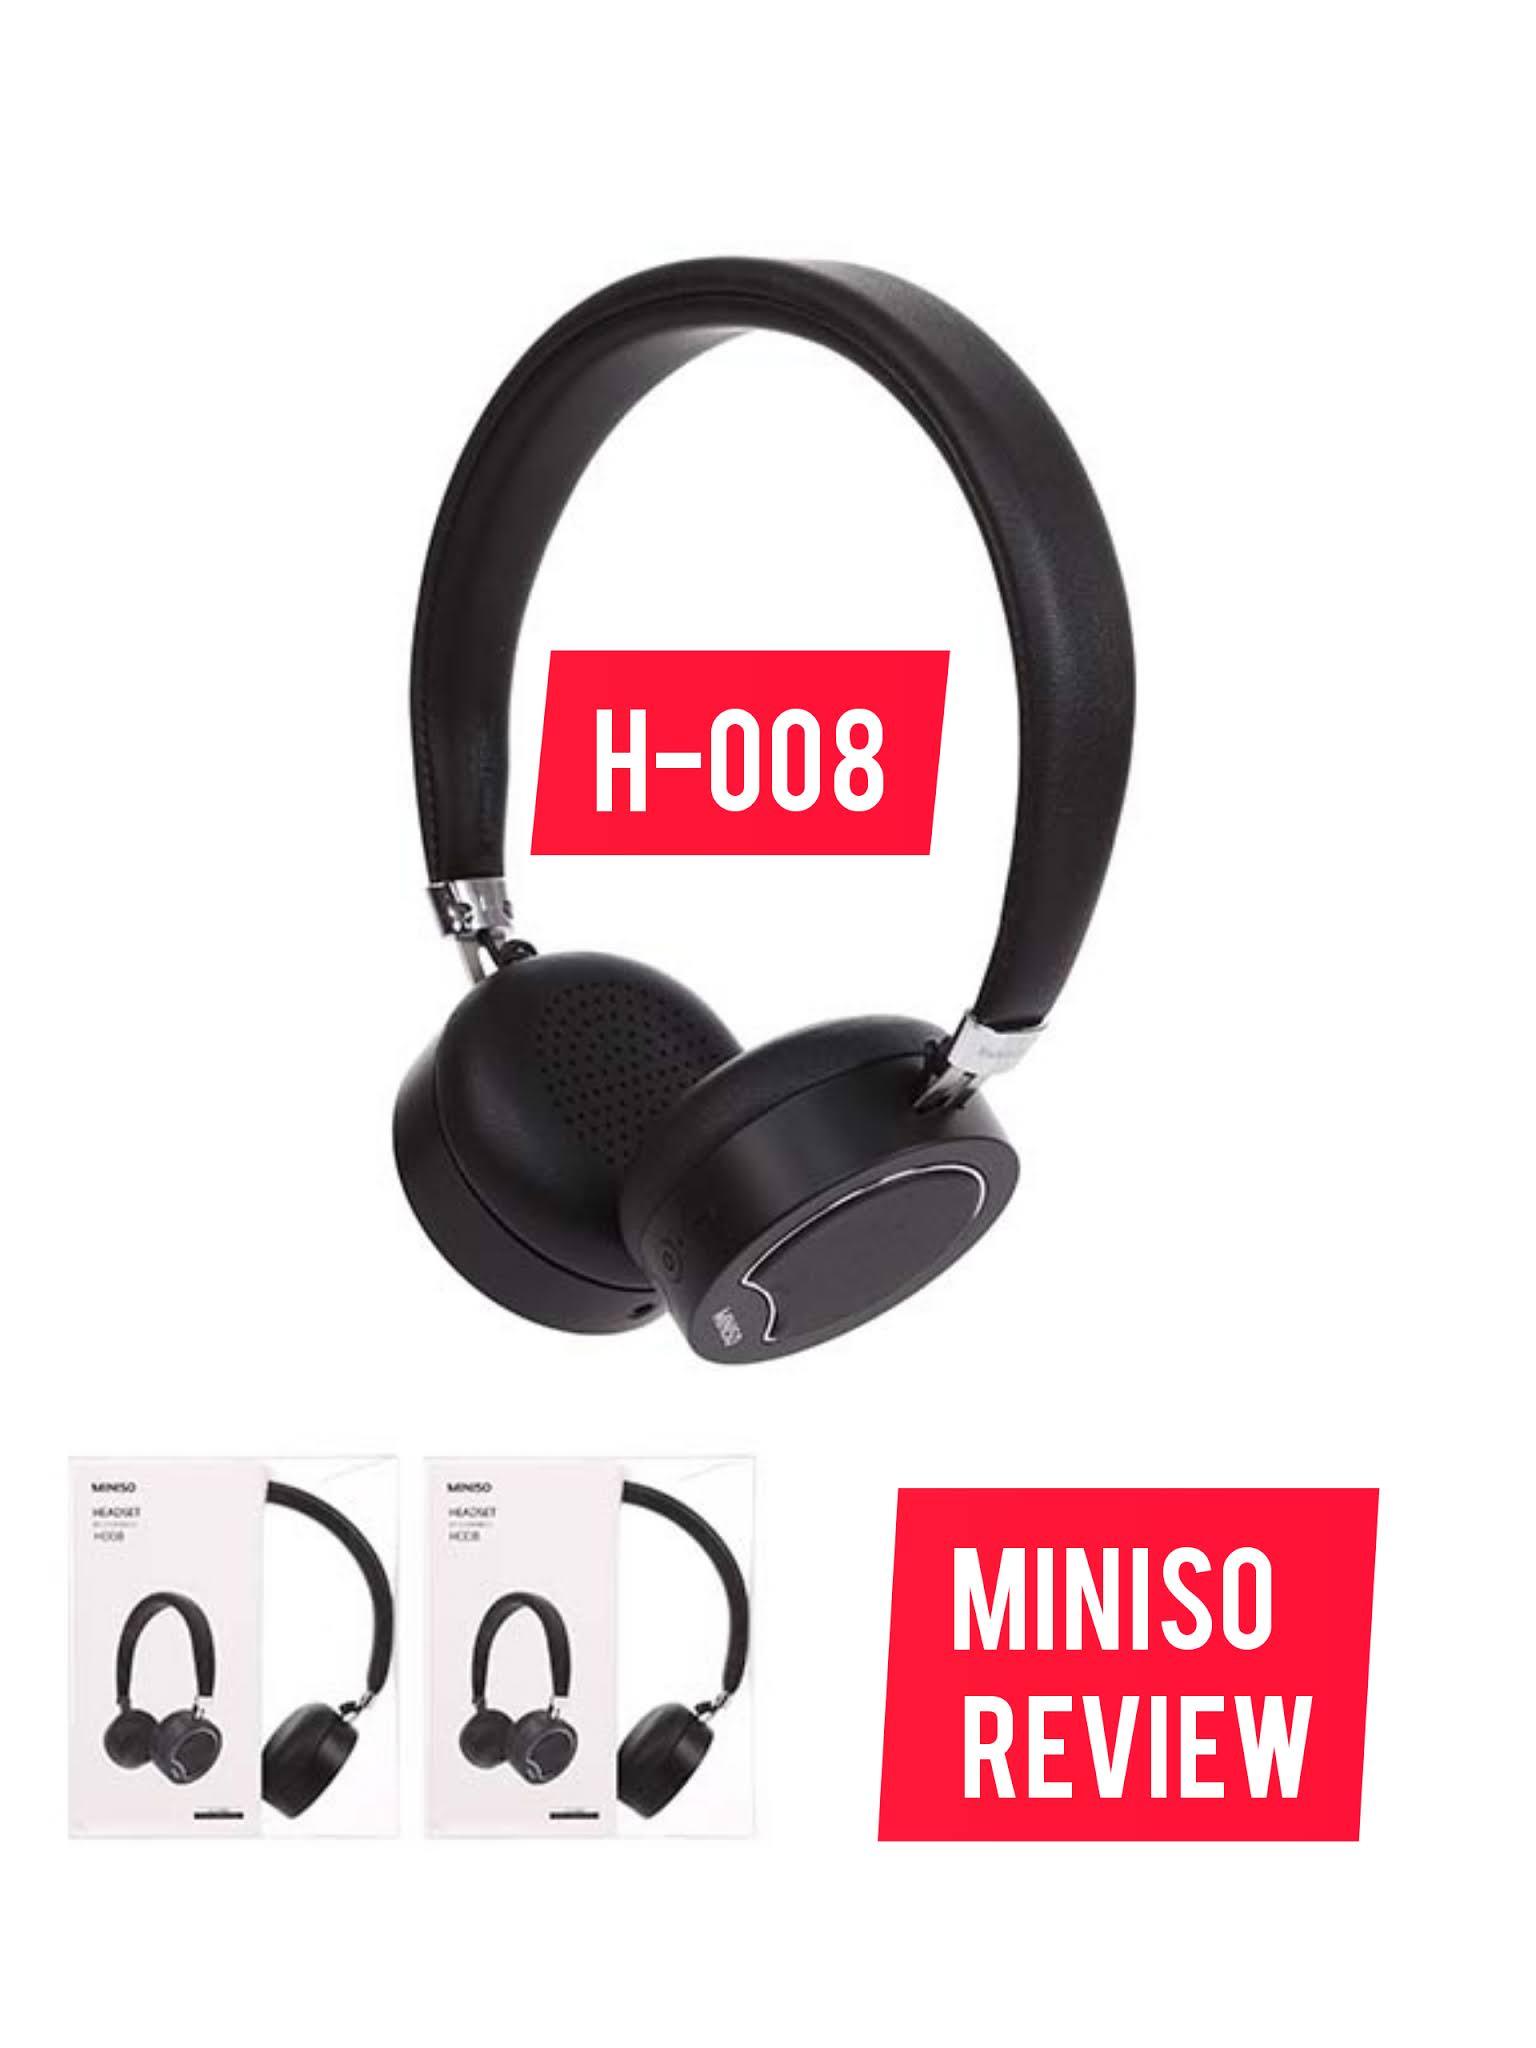 Wireless Headset Model: H-008 (Black)